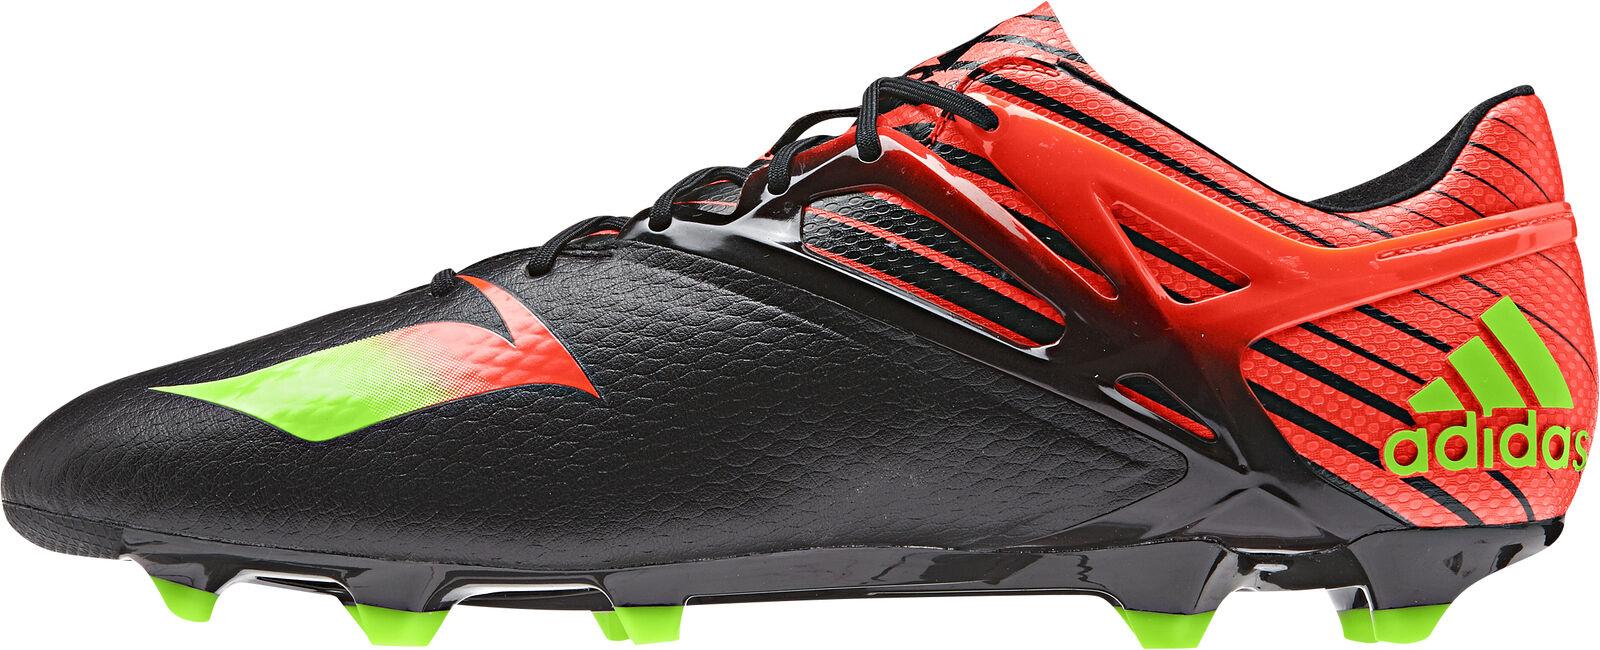 Adidas Messi 15.1 AG tierra firme para Hombre botas De Fútbol-Negro